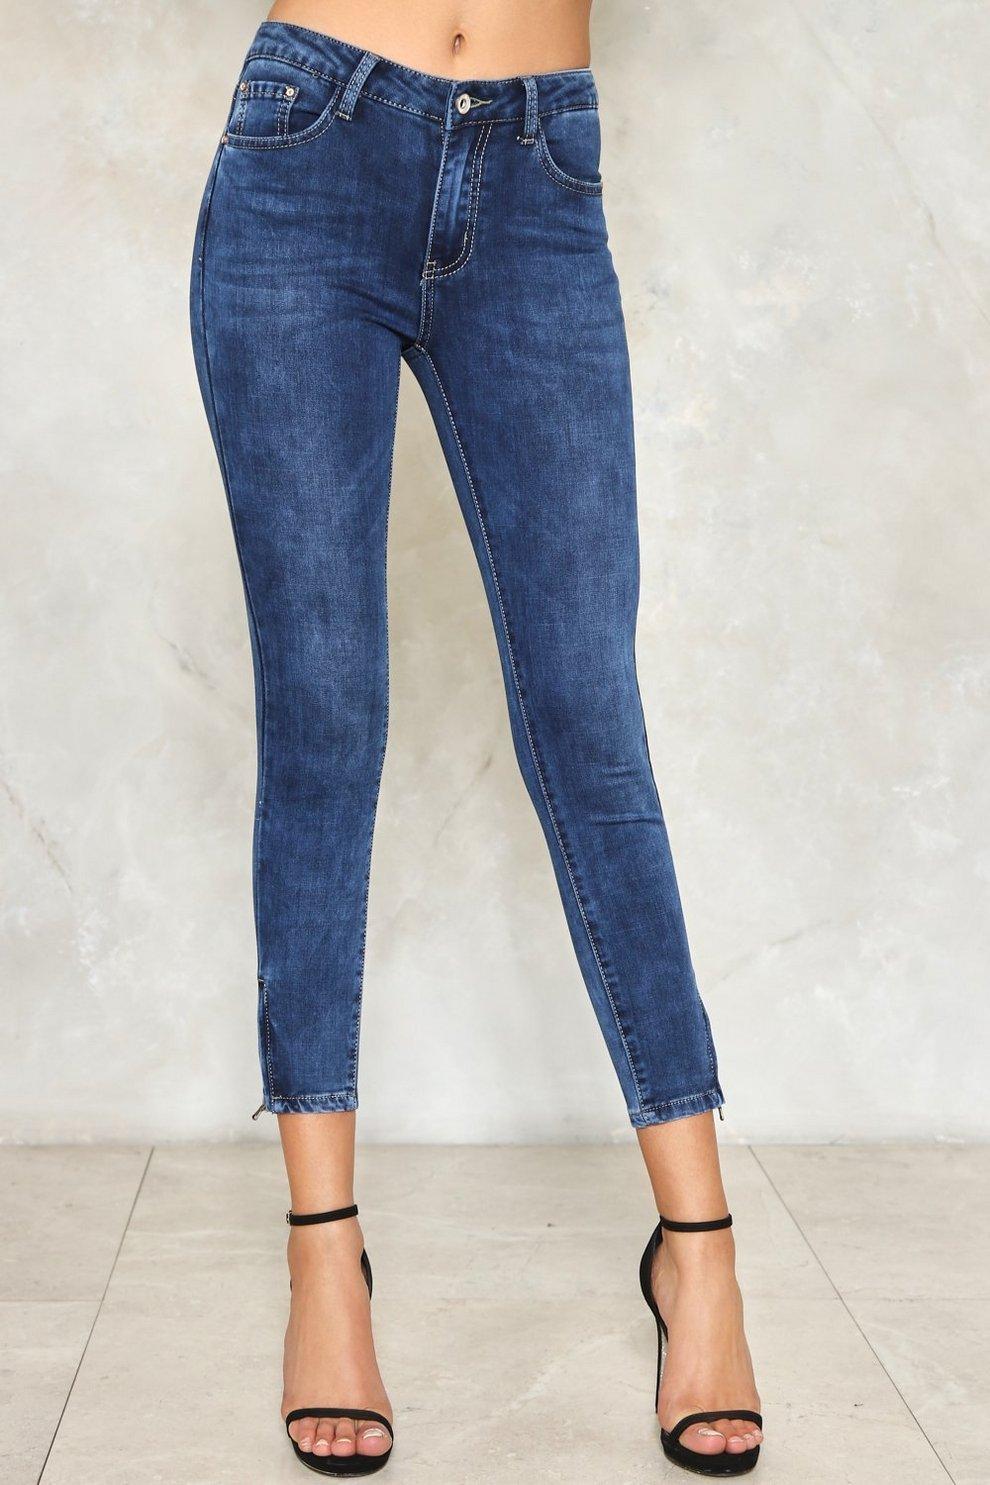 e5d42b919f Make It Zippy Skinny Jeans | Shop Clothes at Nasty Gal!